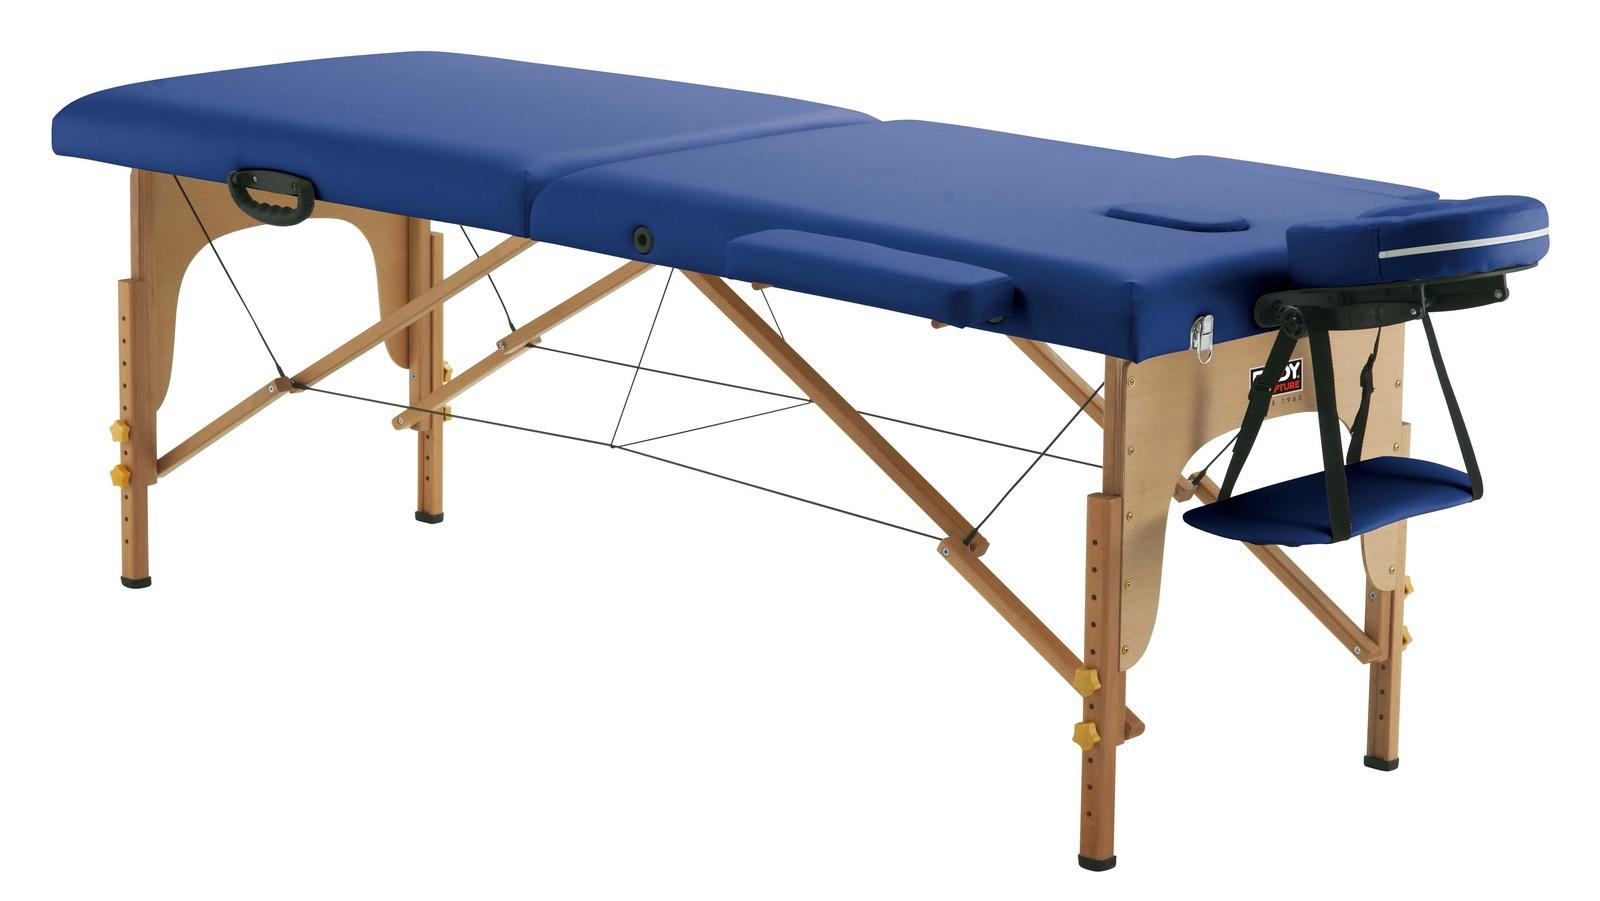 Массажный стол Body Sculpture BM-1310 Массажный стол складной